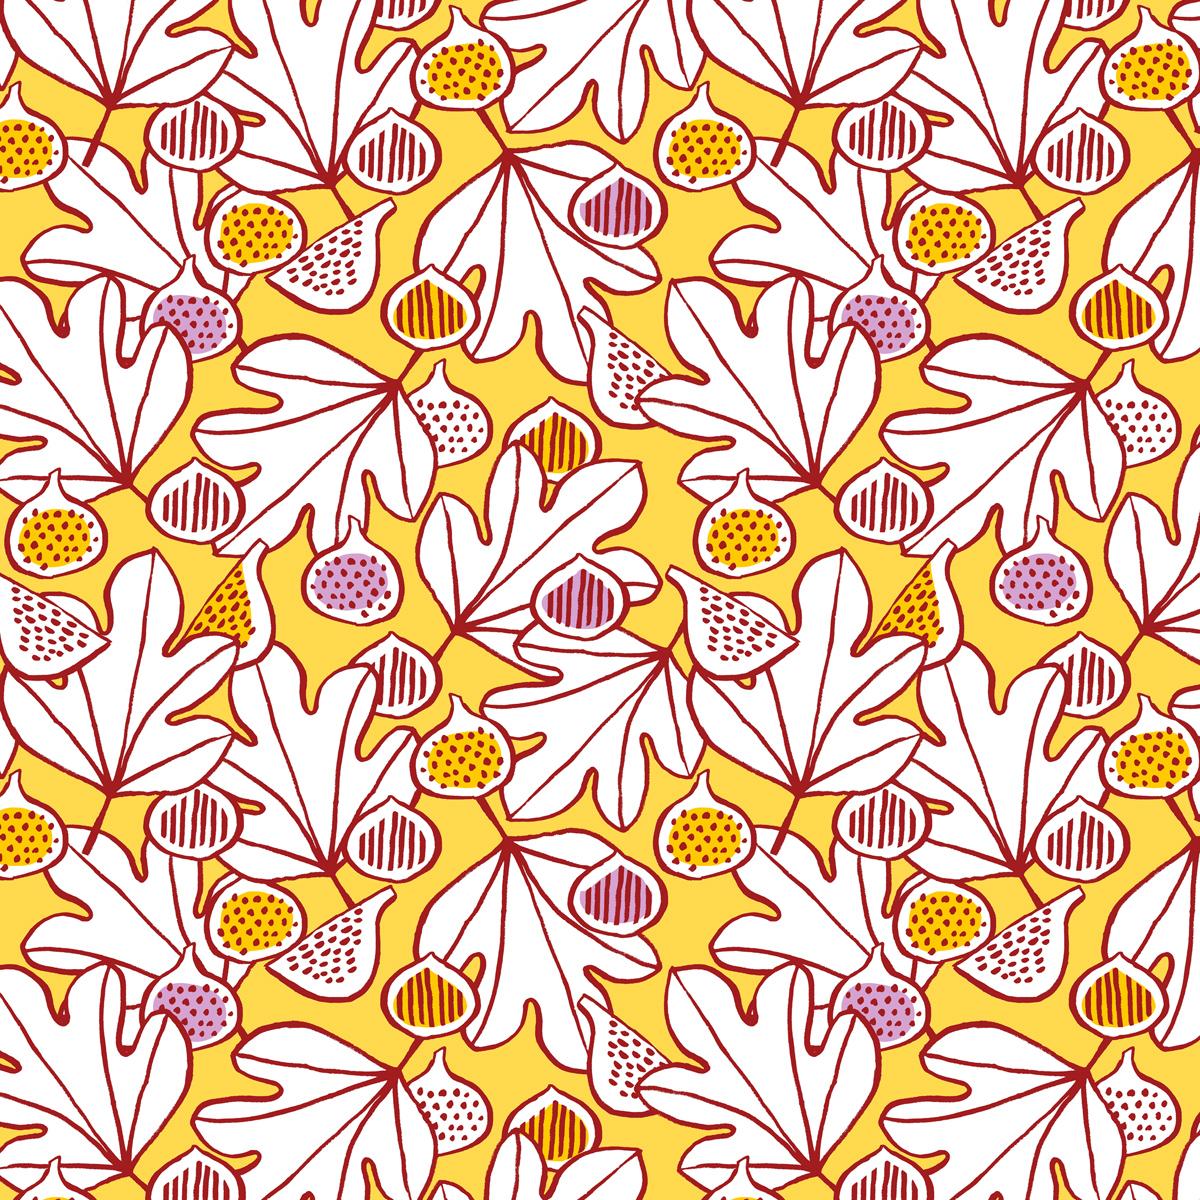 Annalisa Papagna shop - Figs pattern